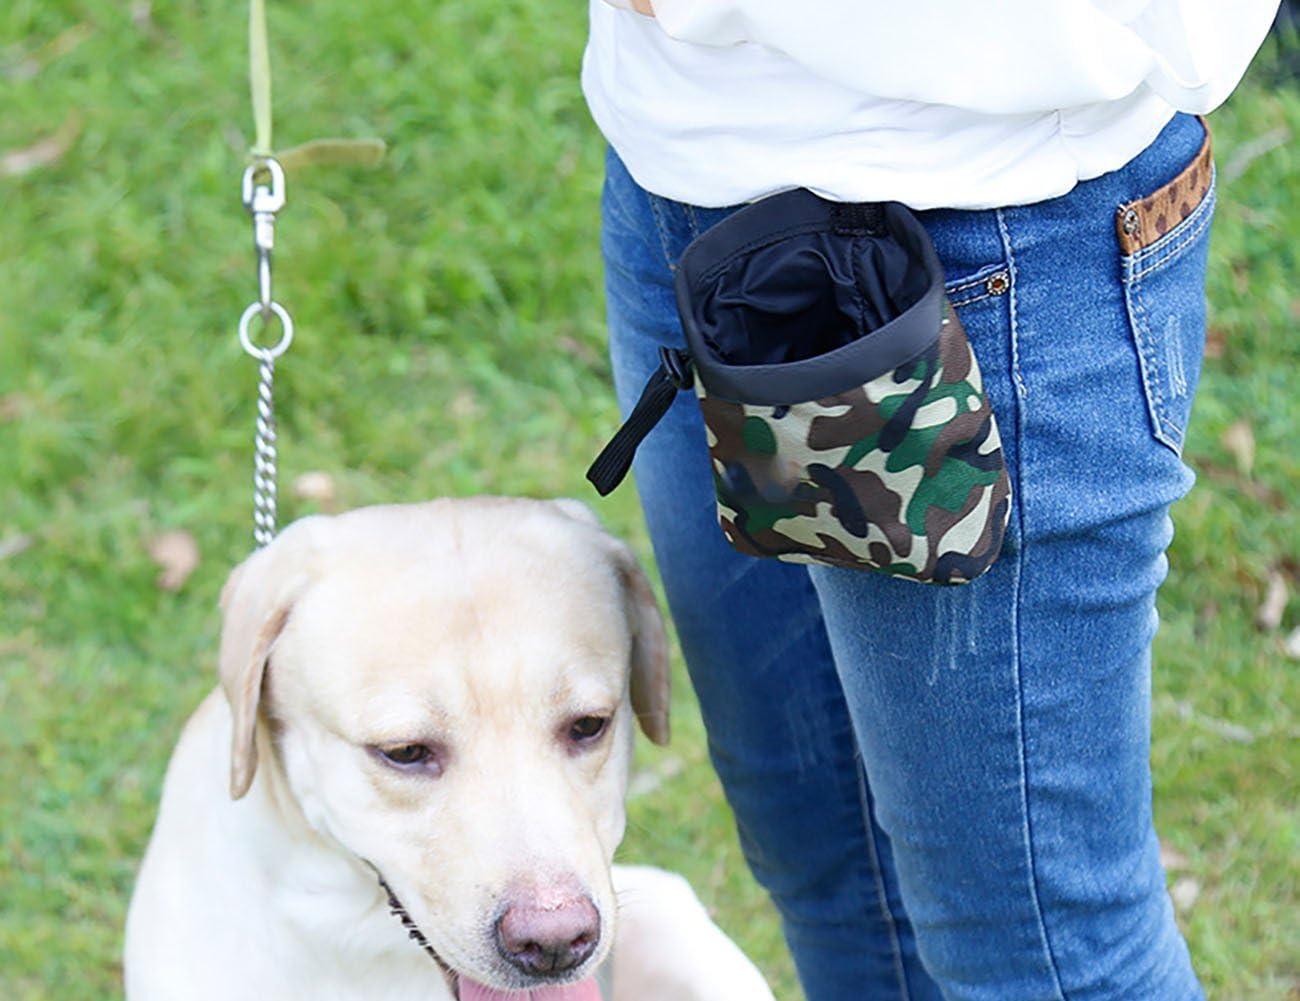 for Carries Pet Toys Uheng Dog Treat Training Pouch /¨C Built-In Poop Bag Dispenser Treats Kibble Key Pet Snack Bag /¨C Clip on Waist